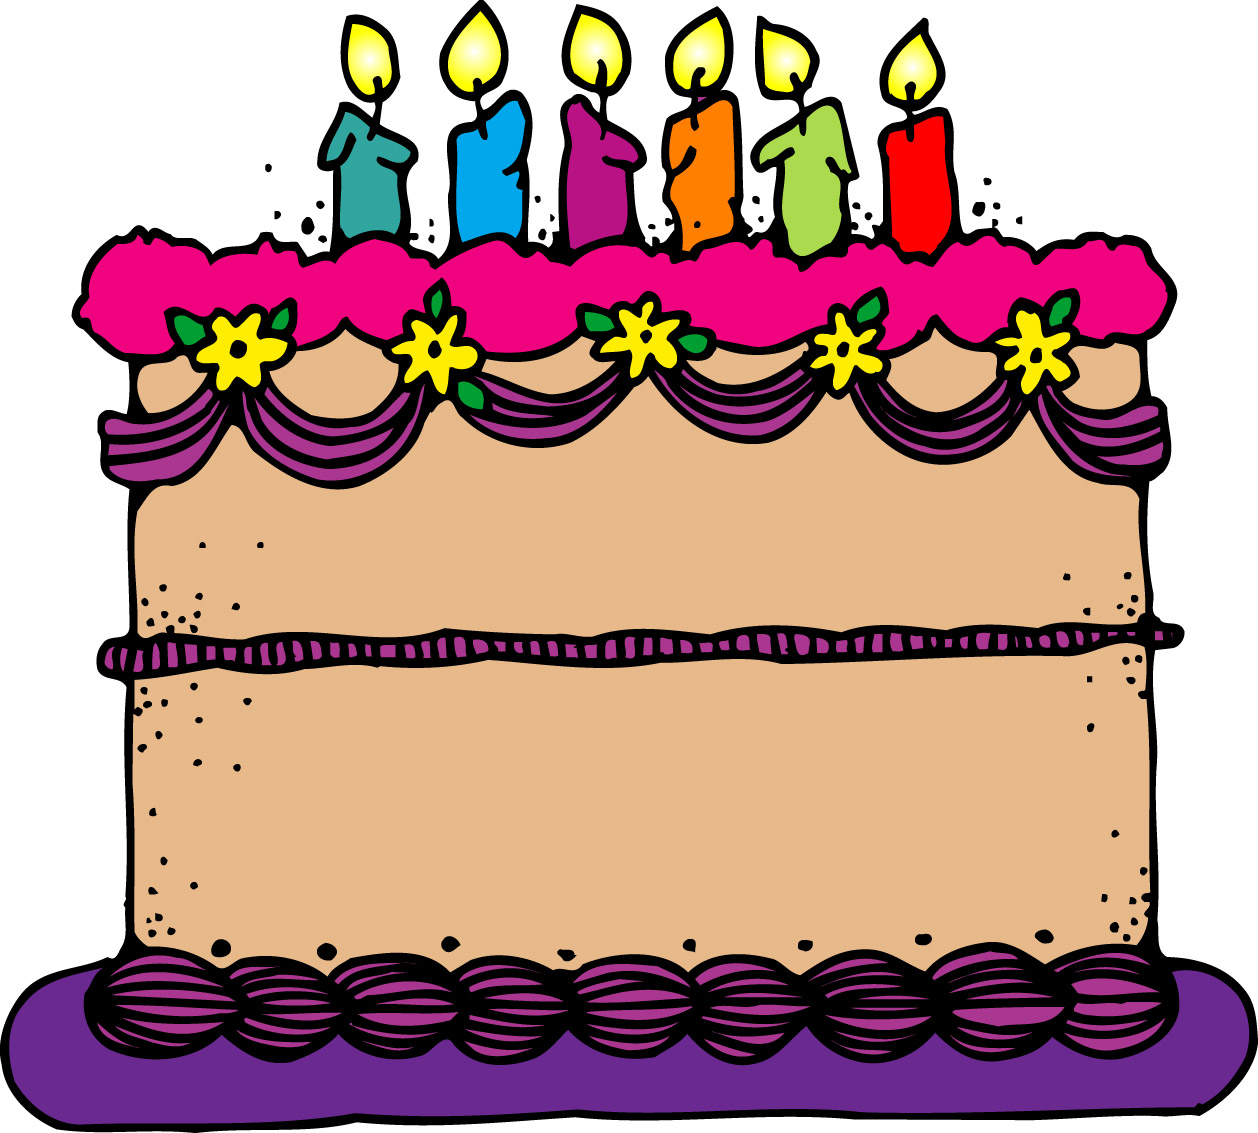 Birthday cake clip art free . - Birthday Cake Clipart